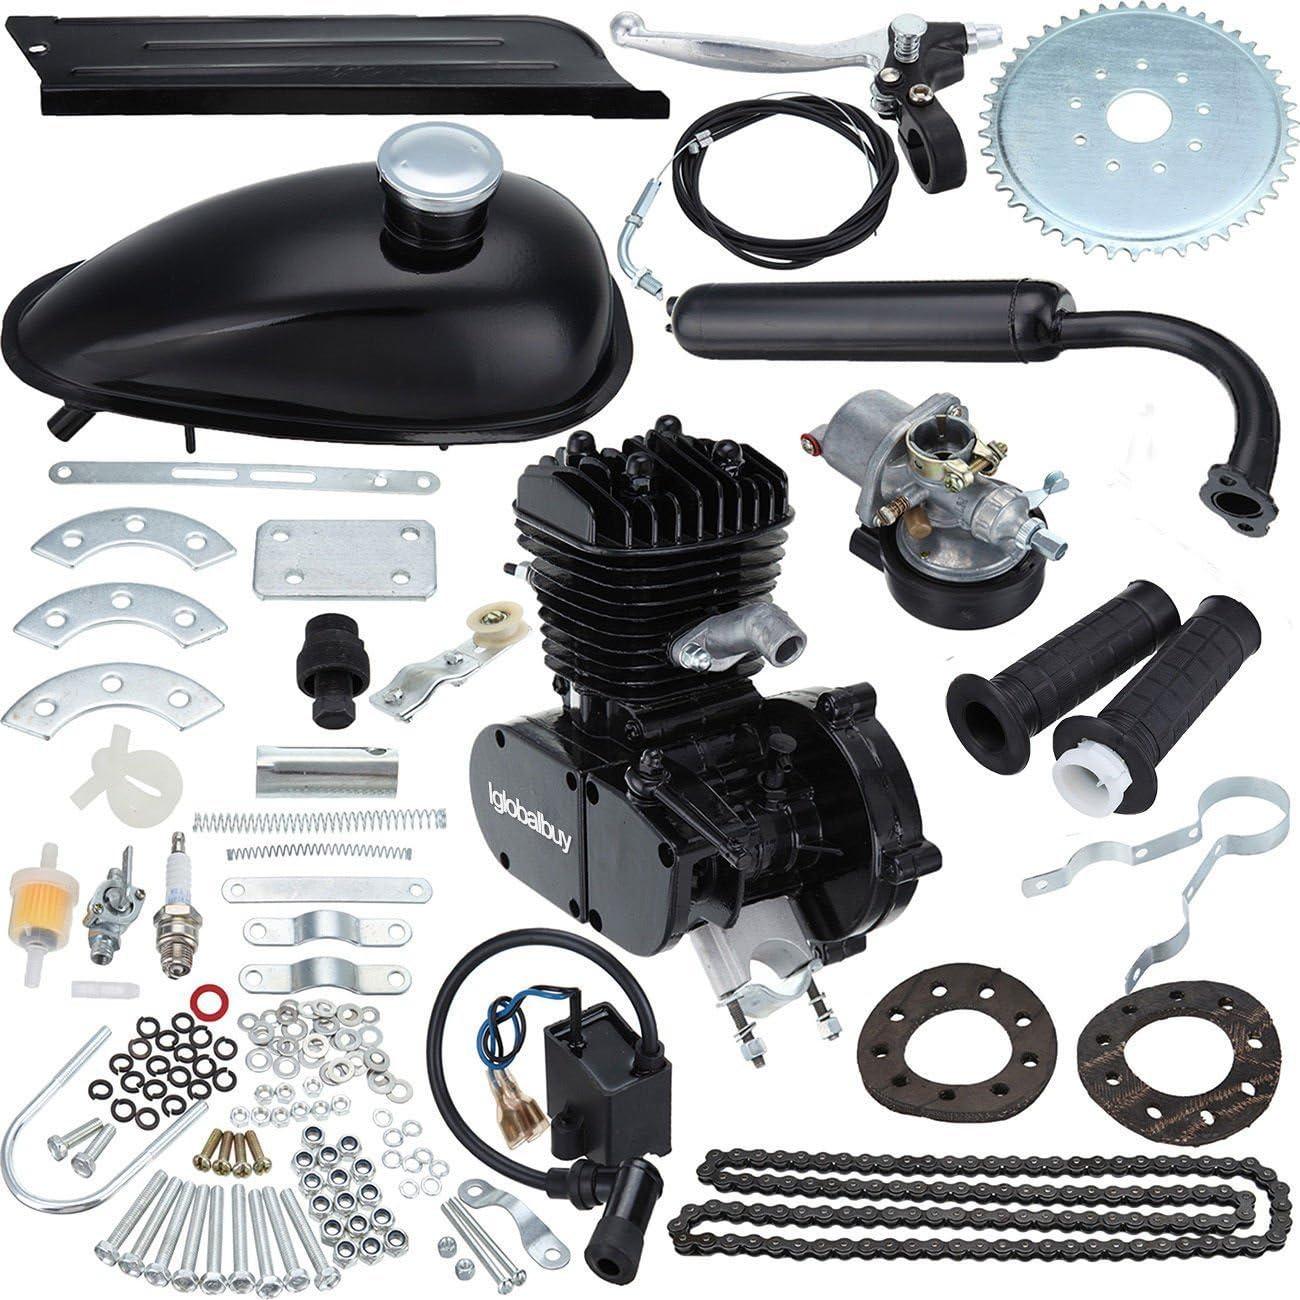 PanelTech 48CC 49CC 50CC 2-Stroke Engine Gas Kit fits 26 28 Motorized Mountain Bicycle Bike Silver